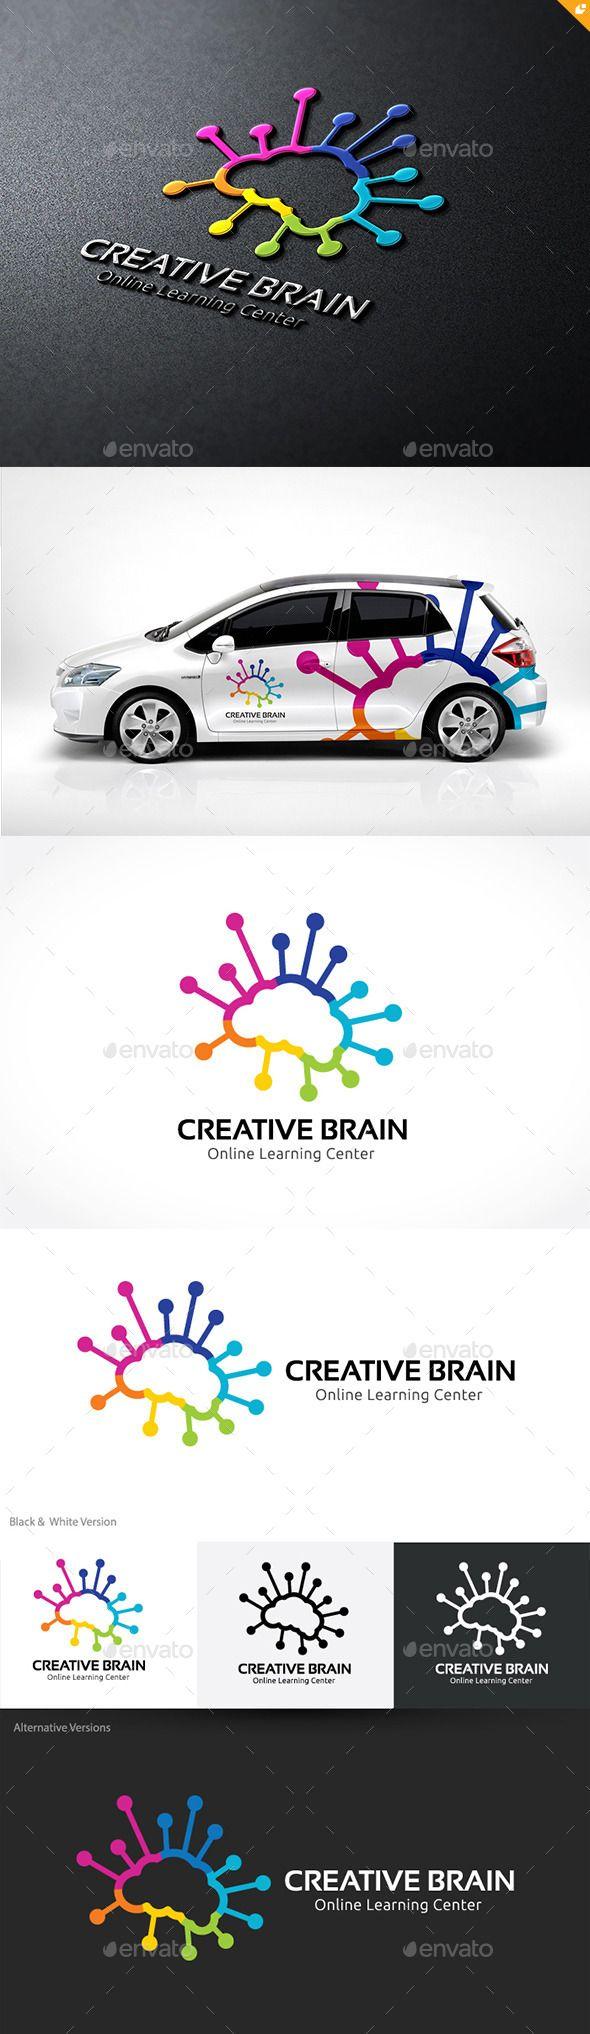 Creative Brain Logo Template PSD, Vector EPS, AI #logotype Download here: http://graphicriver.net/item/creative-brain/10241849?ref=ksioks